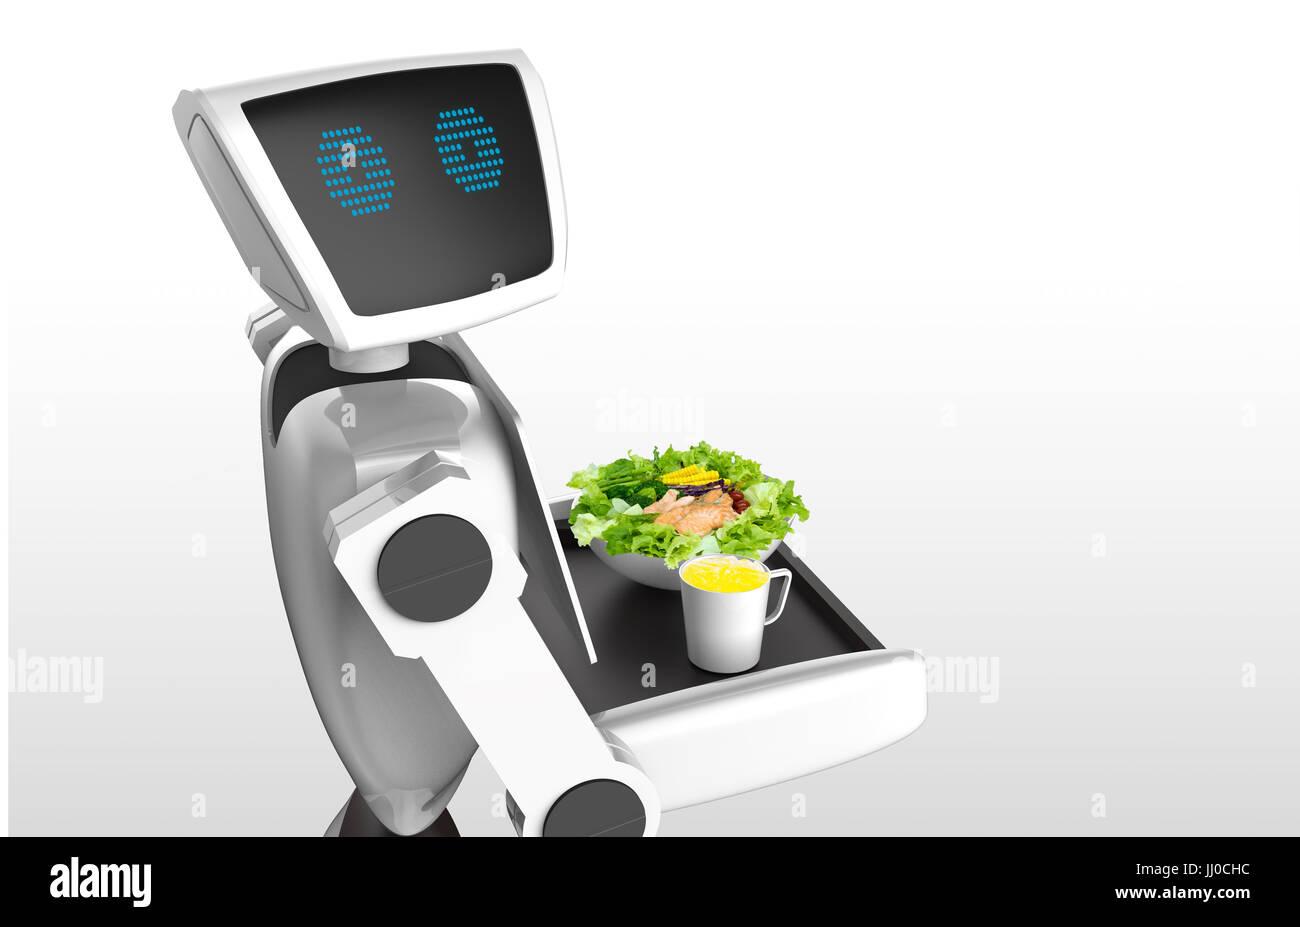 Tendencias tecnología robótica concepto empresarial. Asistente personal autónomo robot personal para servir zumo Foto de stock